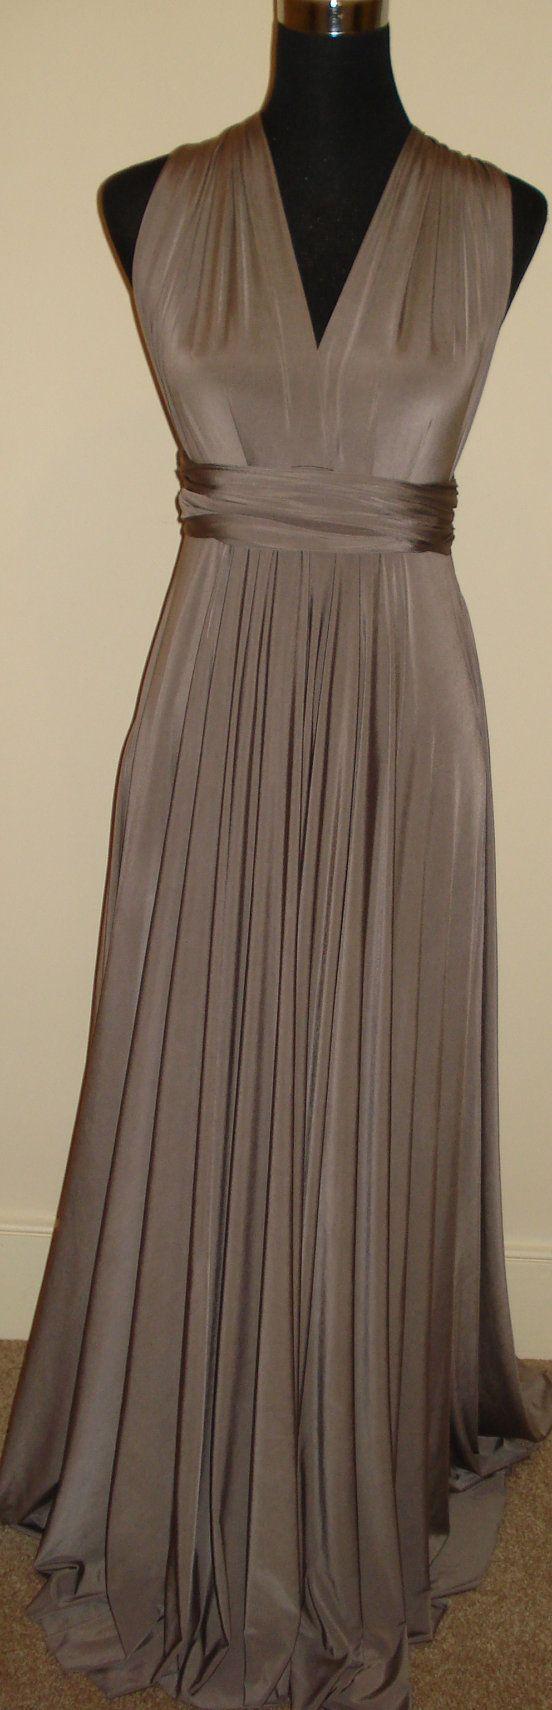 Mocha Bridesmaid Dress Prom Formal Evening Dress by stitchawayrose